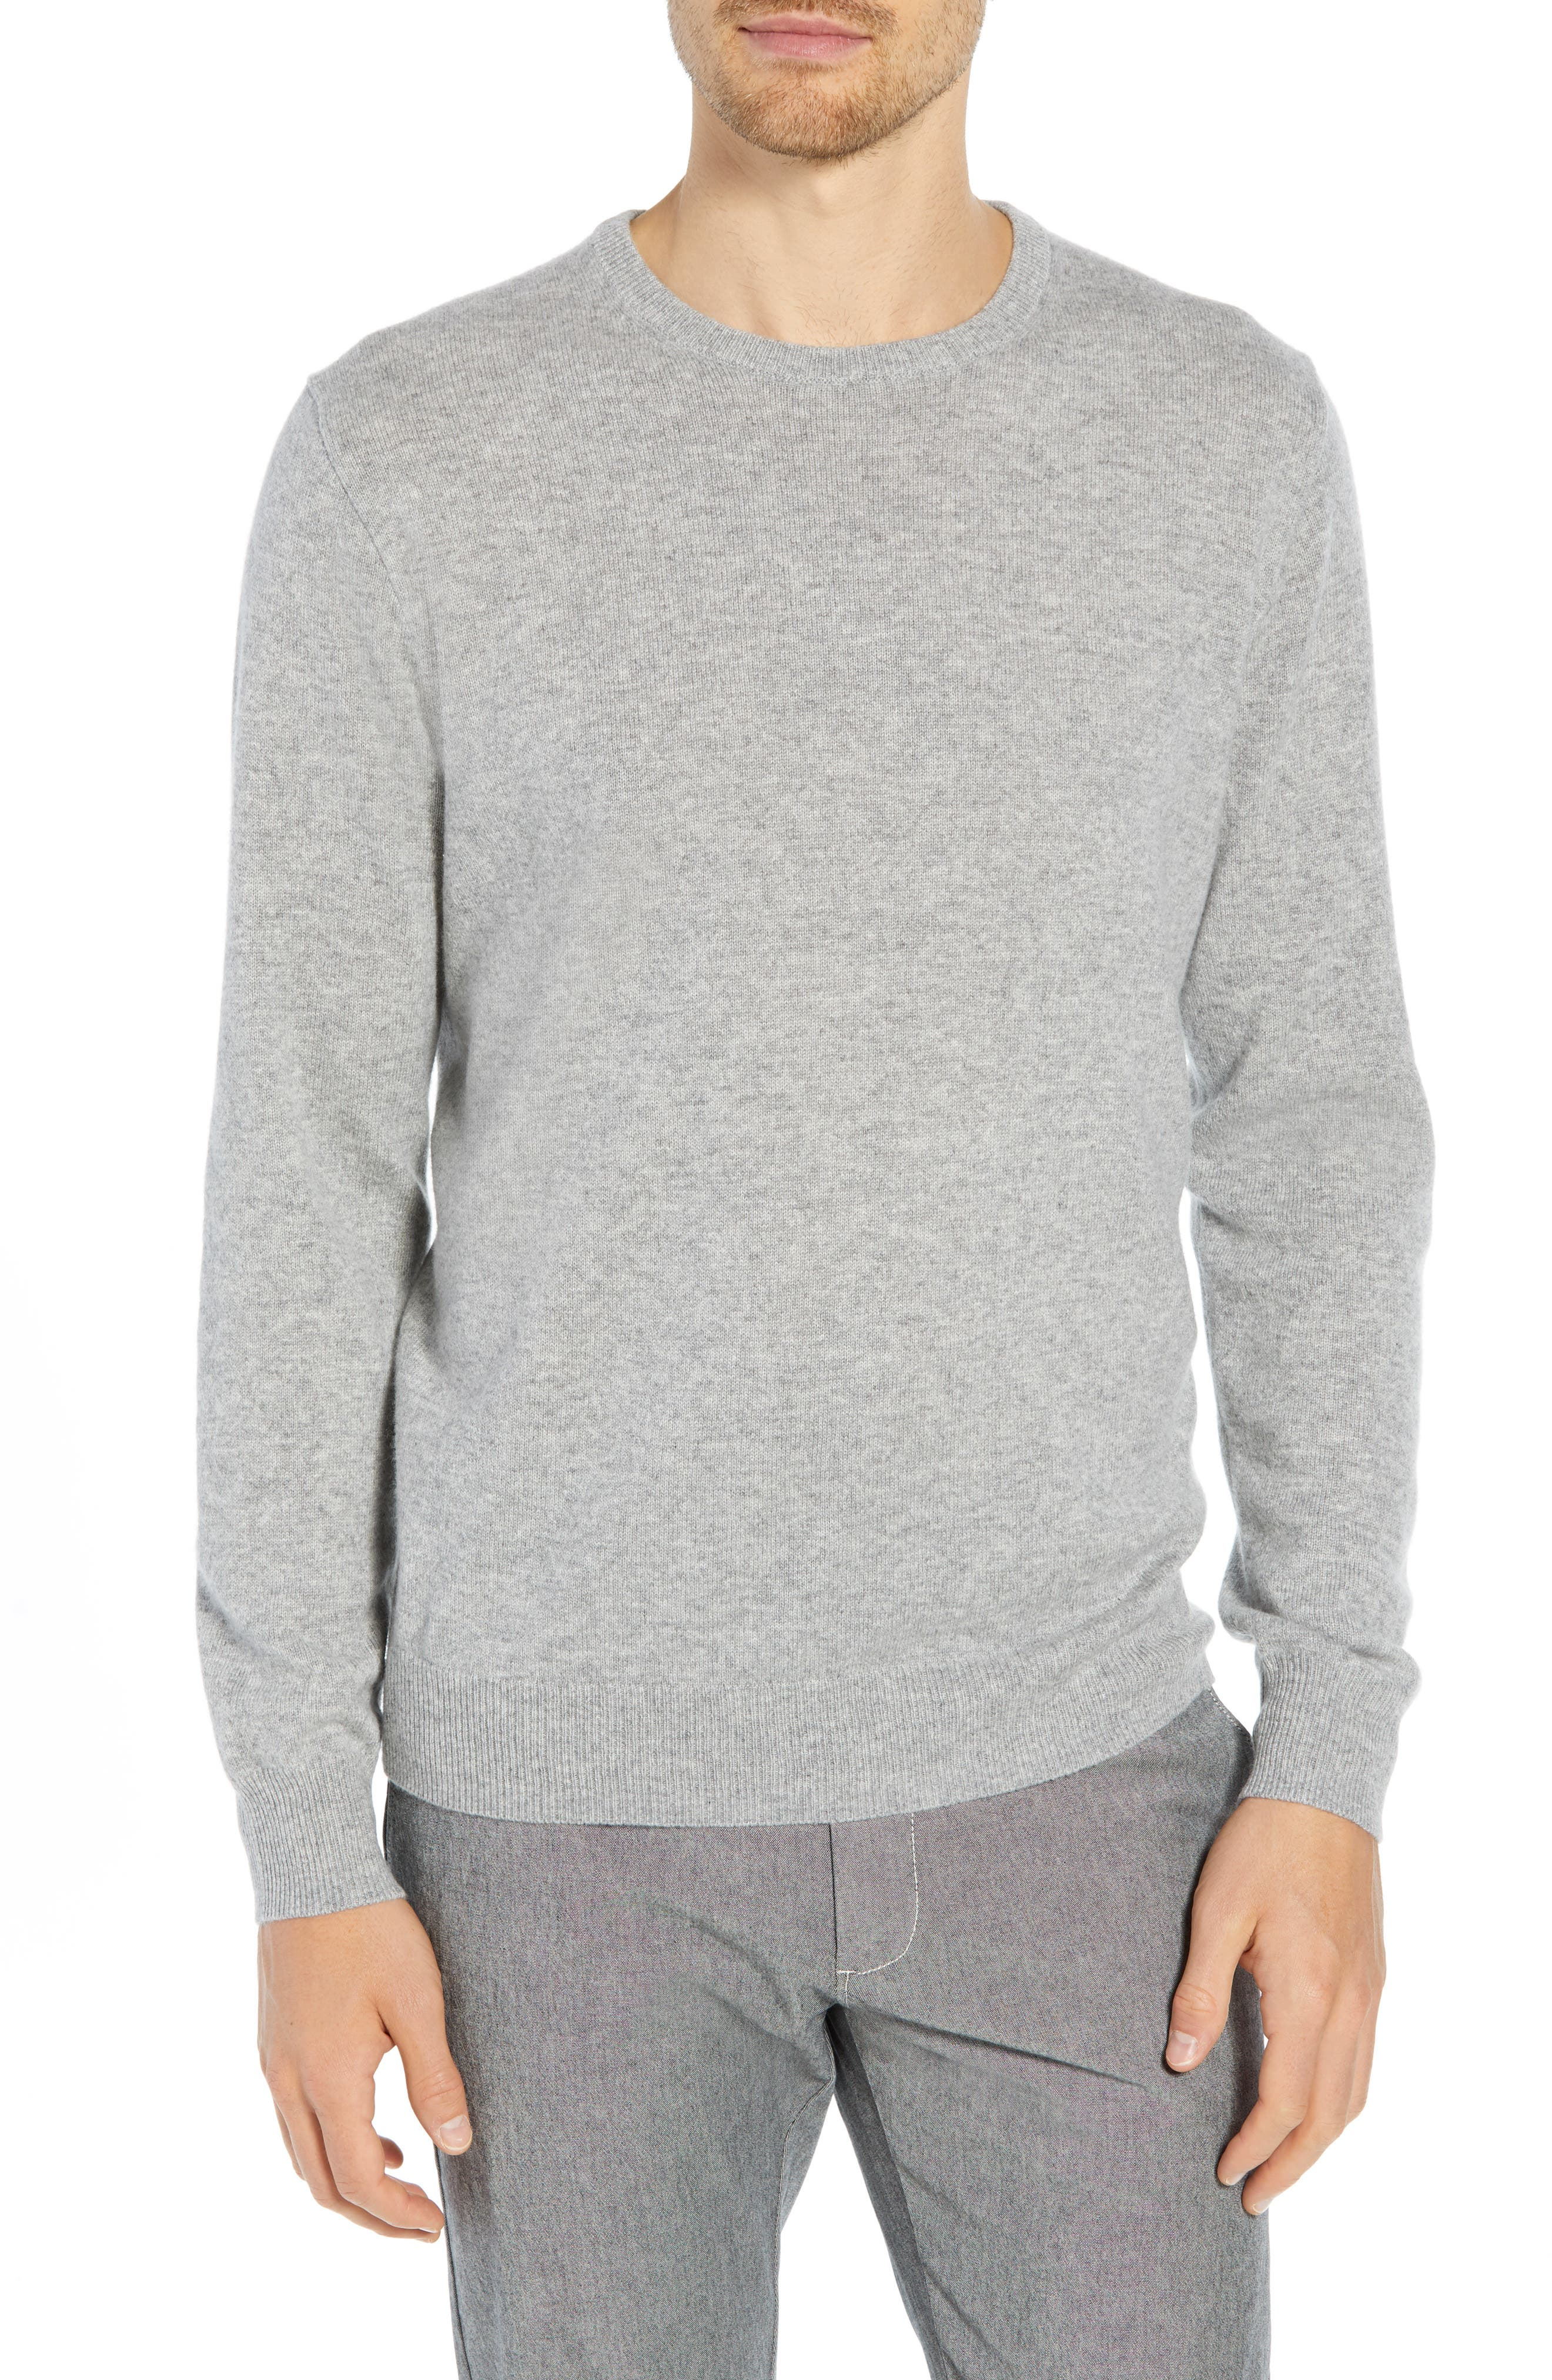 Everyday Cashmere Regular Fit Crewneck Sweater,                         Main,                         color, HEATHER GREY